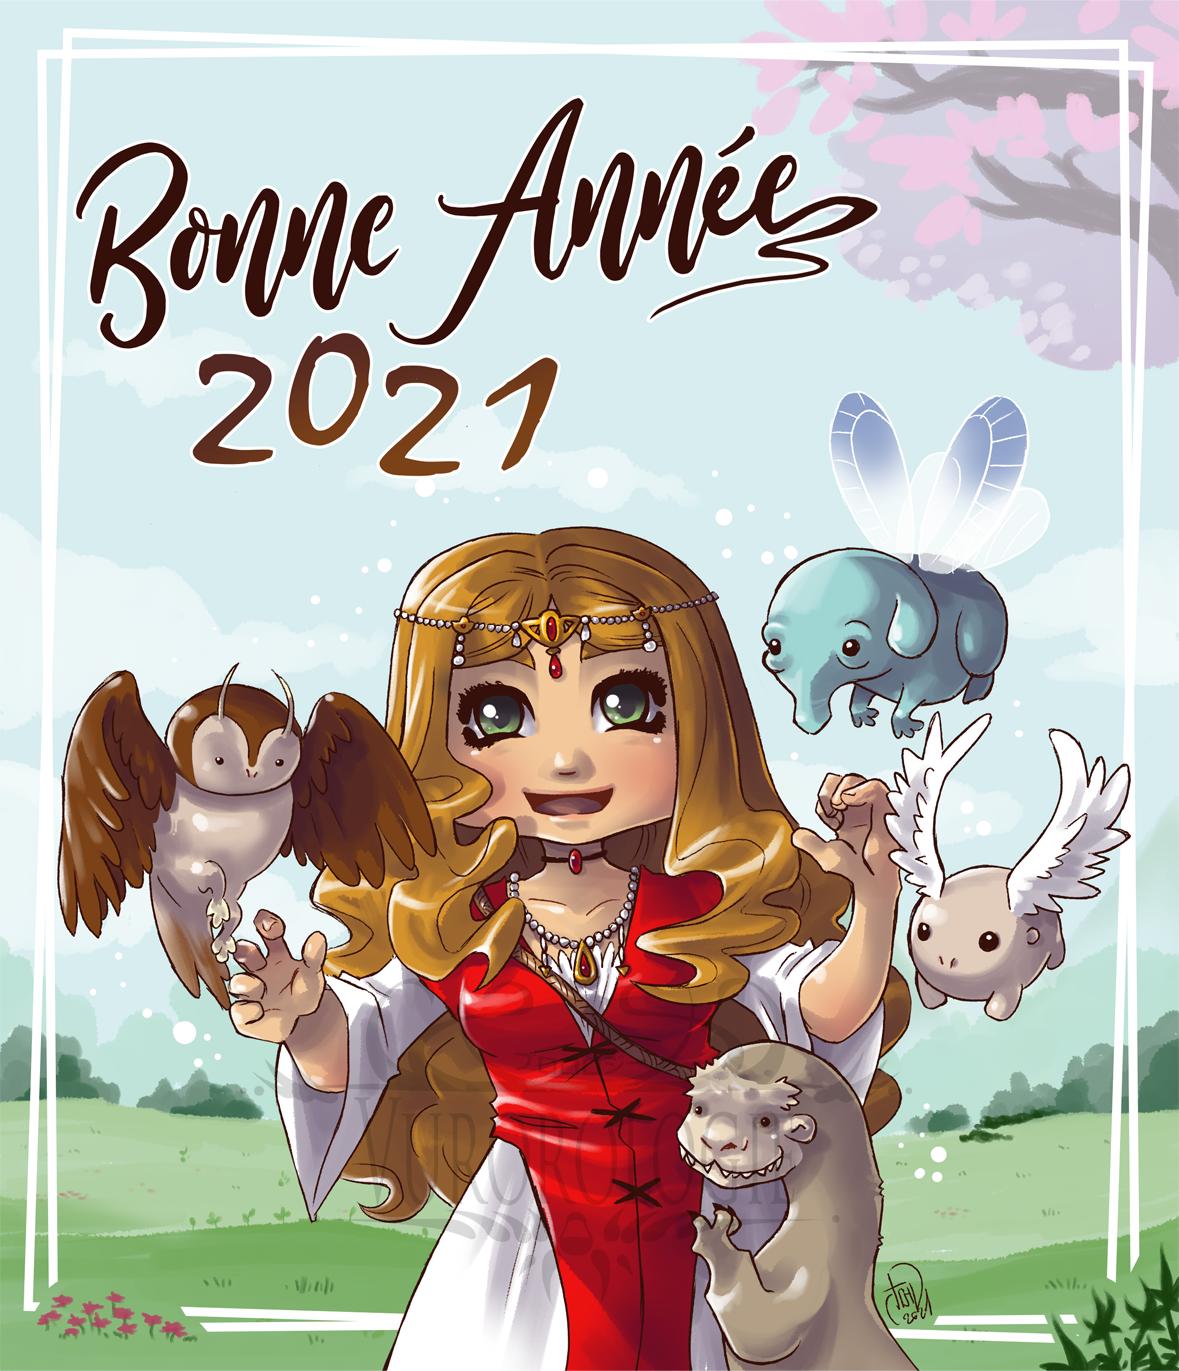 Bonne année 2021 - Aelva